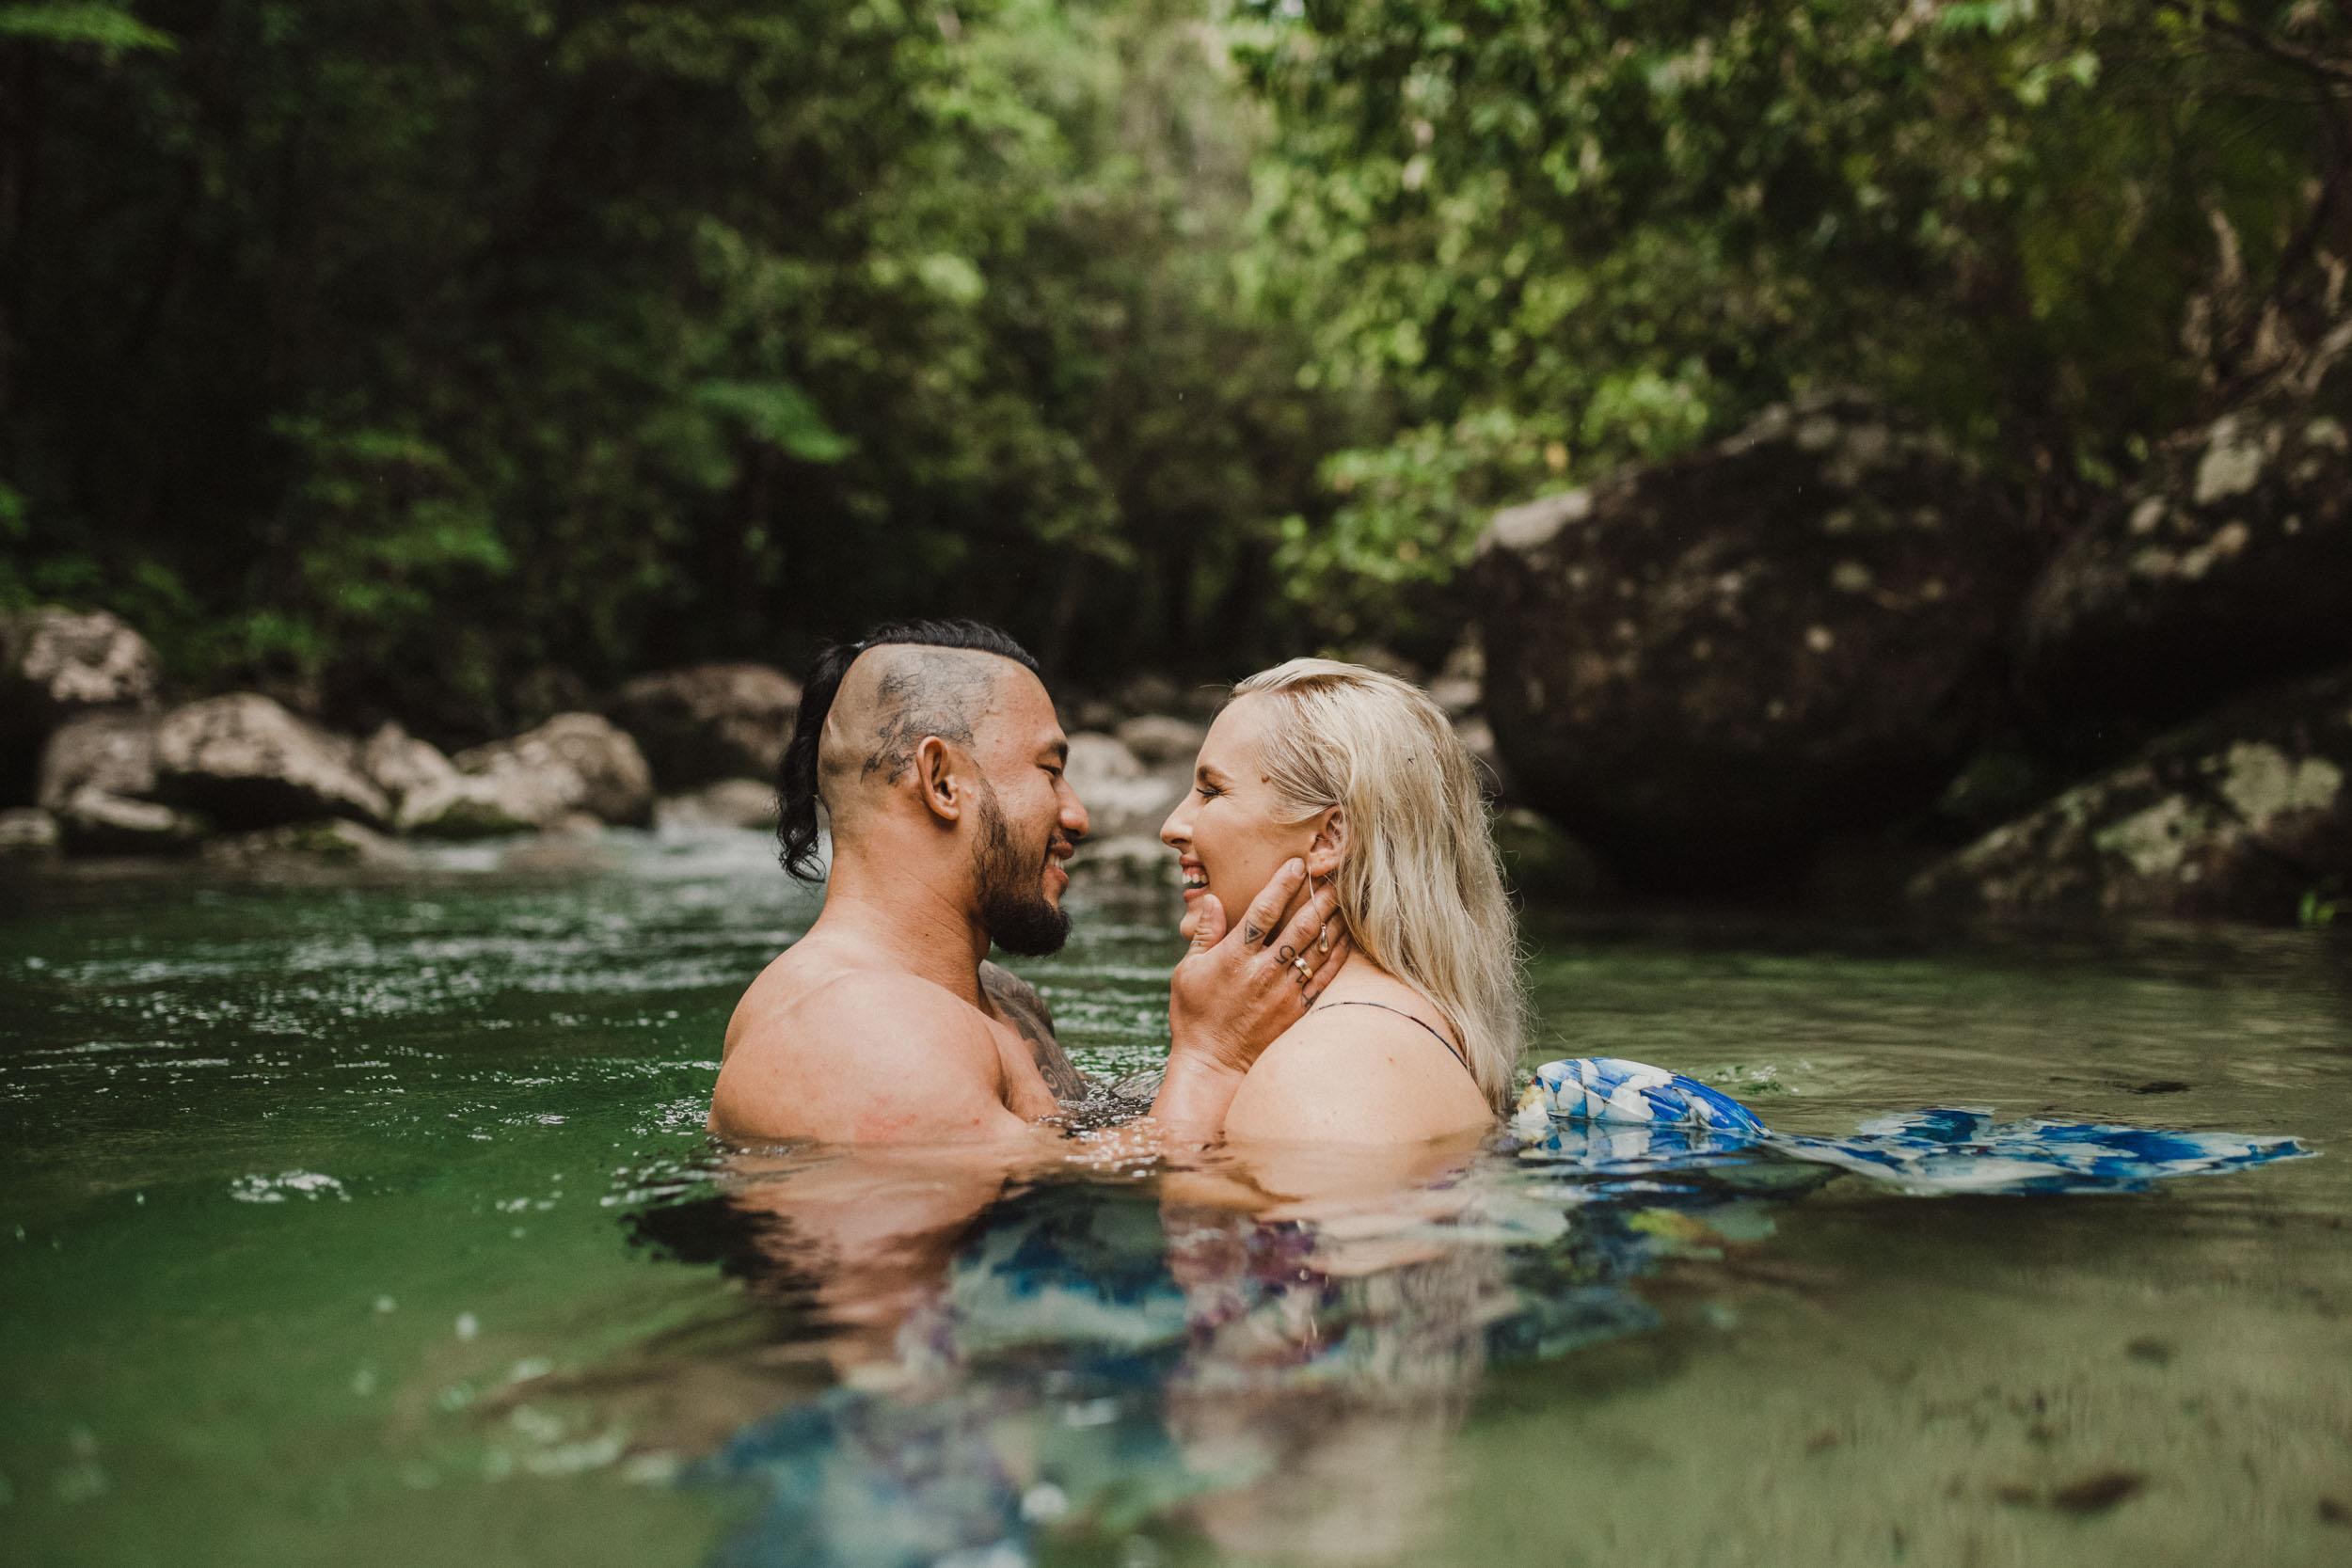 The Raw Photographer - Cairns Wedding Photographer - Rainforest engagement shoot location - Queensland Photography - candid nature-17.jpg